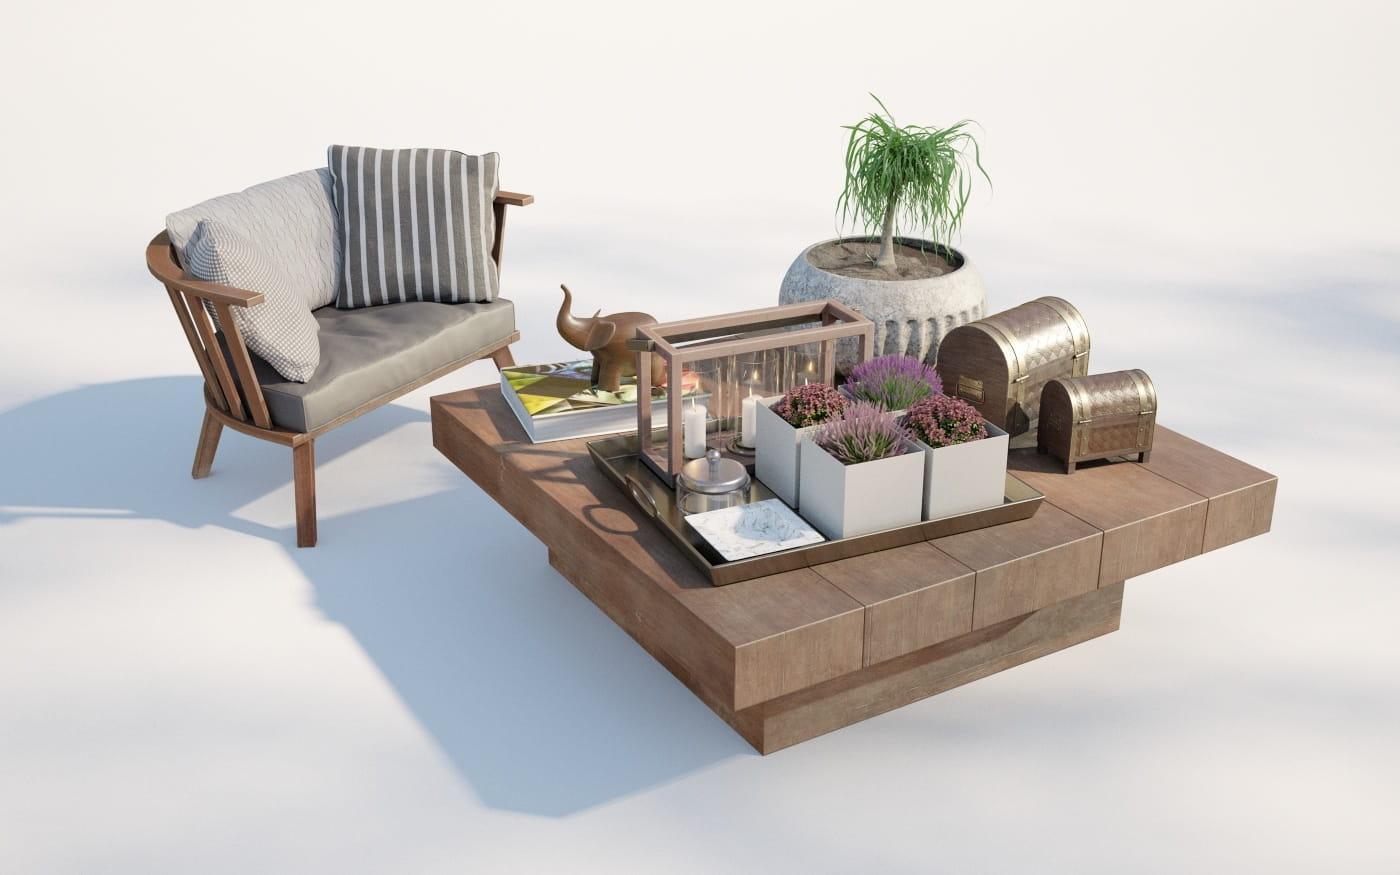 Furniture set 23 AM220 Archmodels